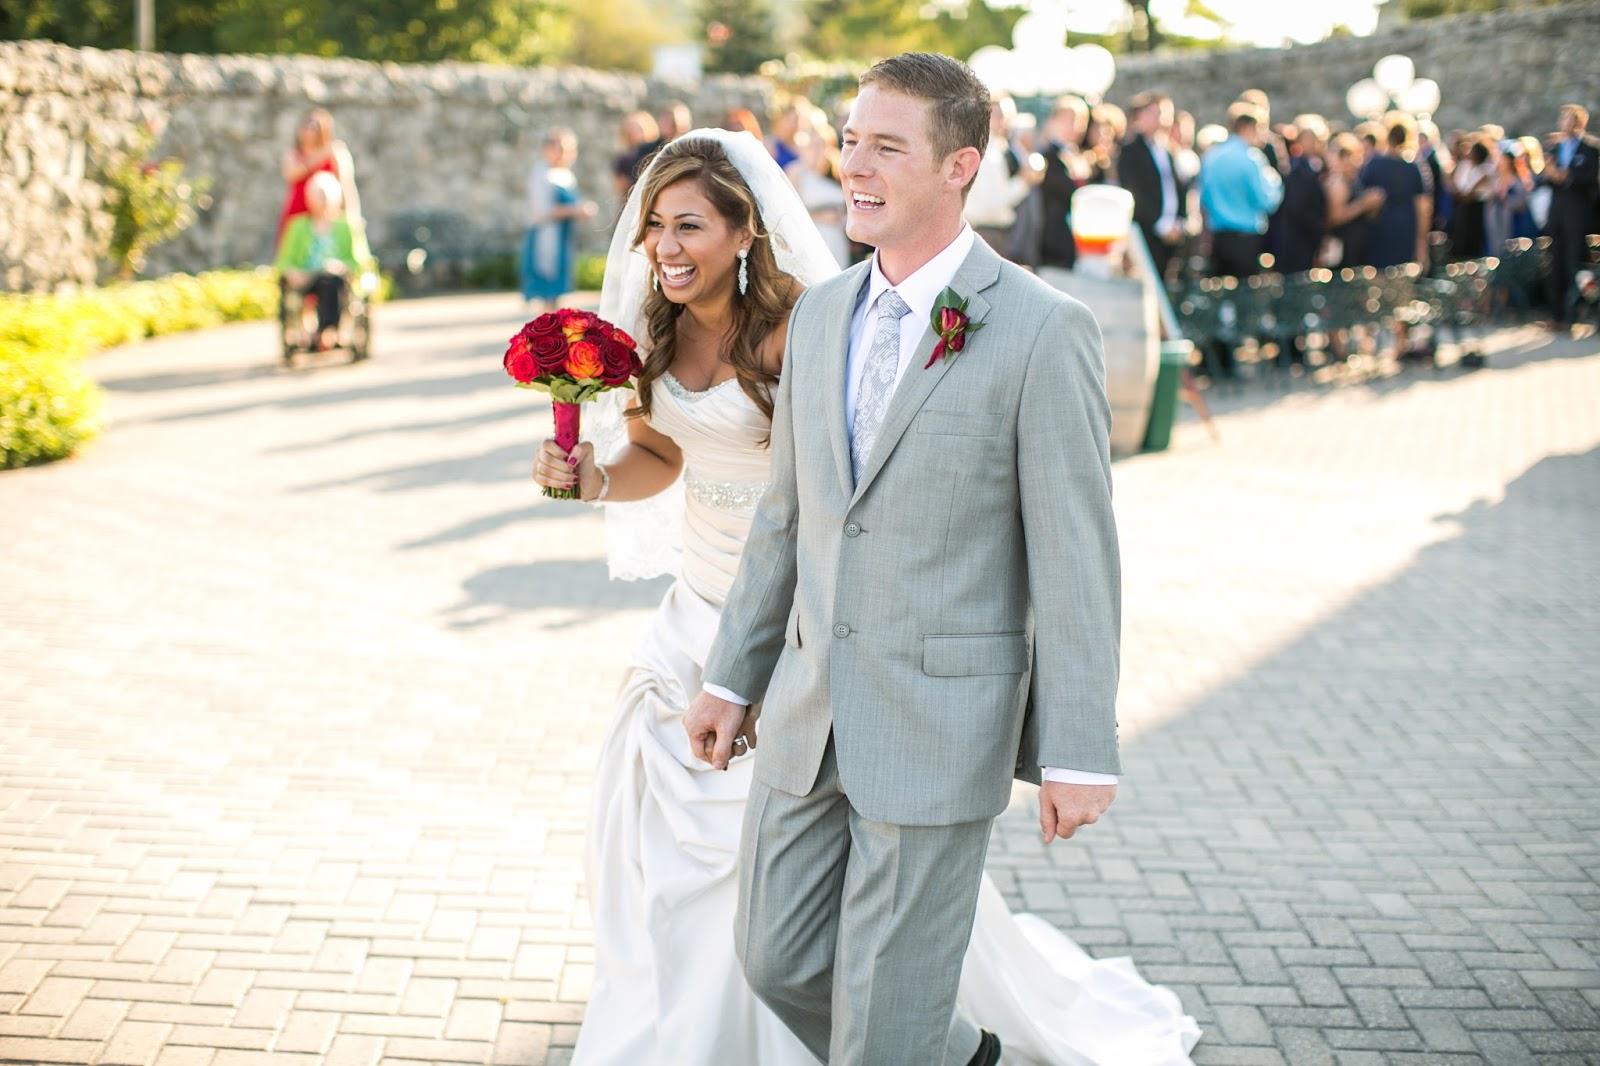 Niagara Falls wedding ceremony // the-lifestyle-project.com